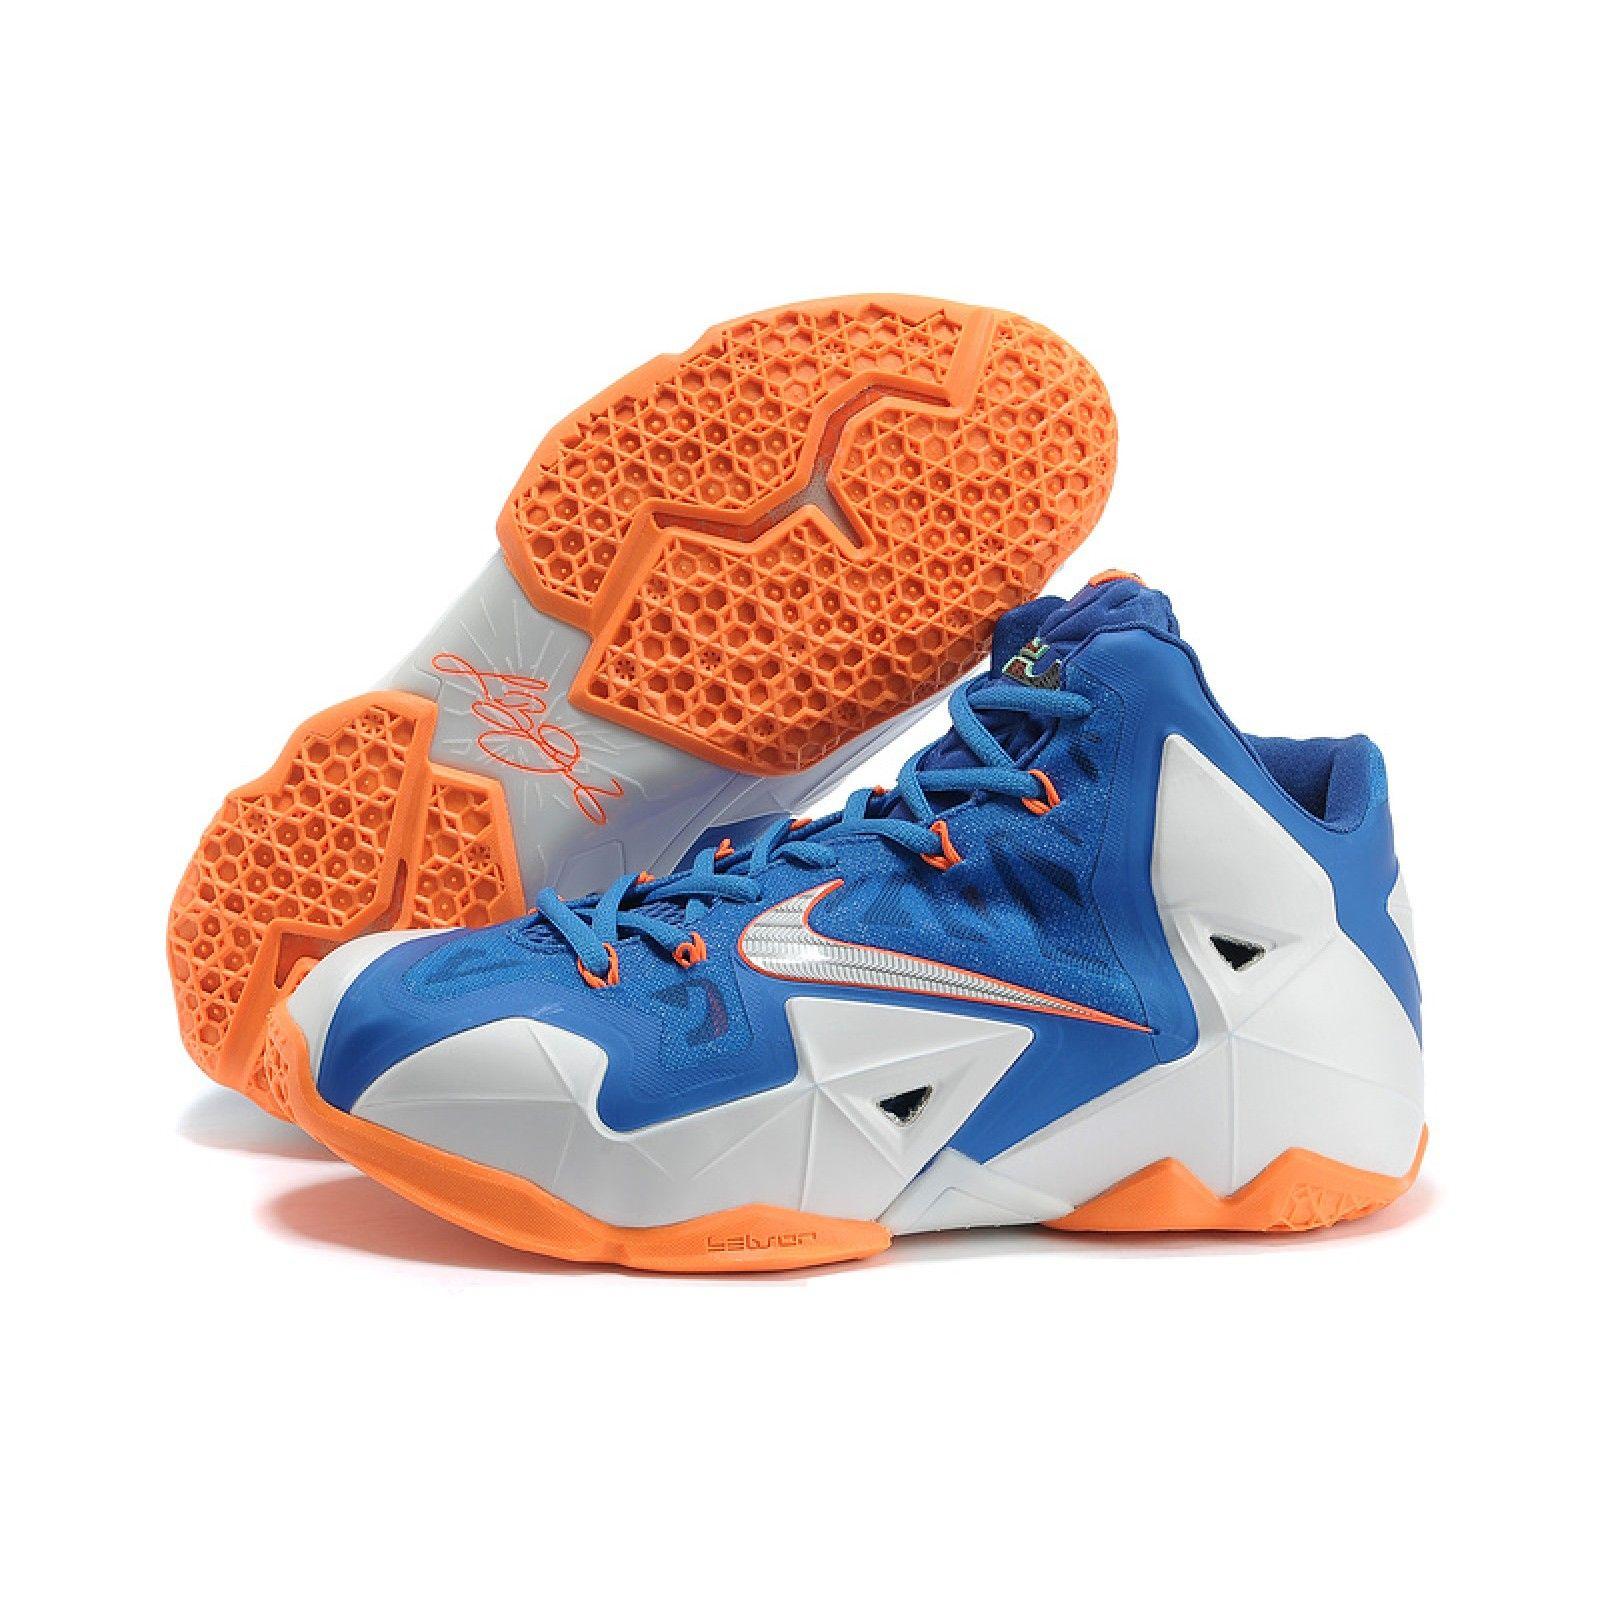 Cheap Nike Lebron 11 White Blue Orange Shoes